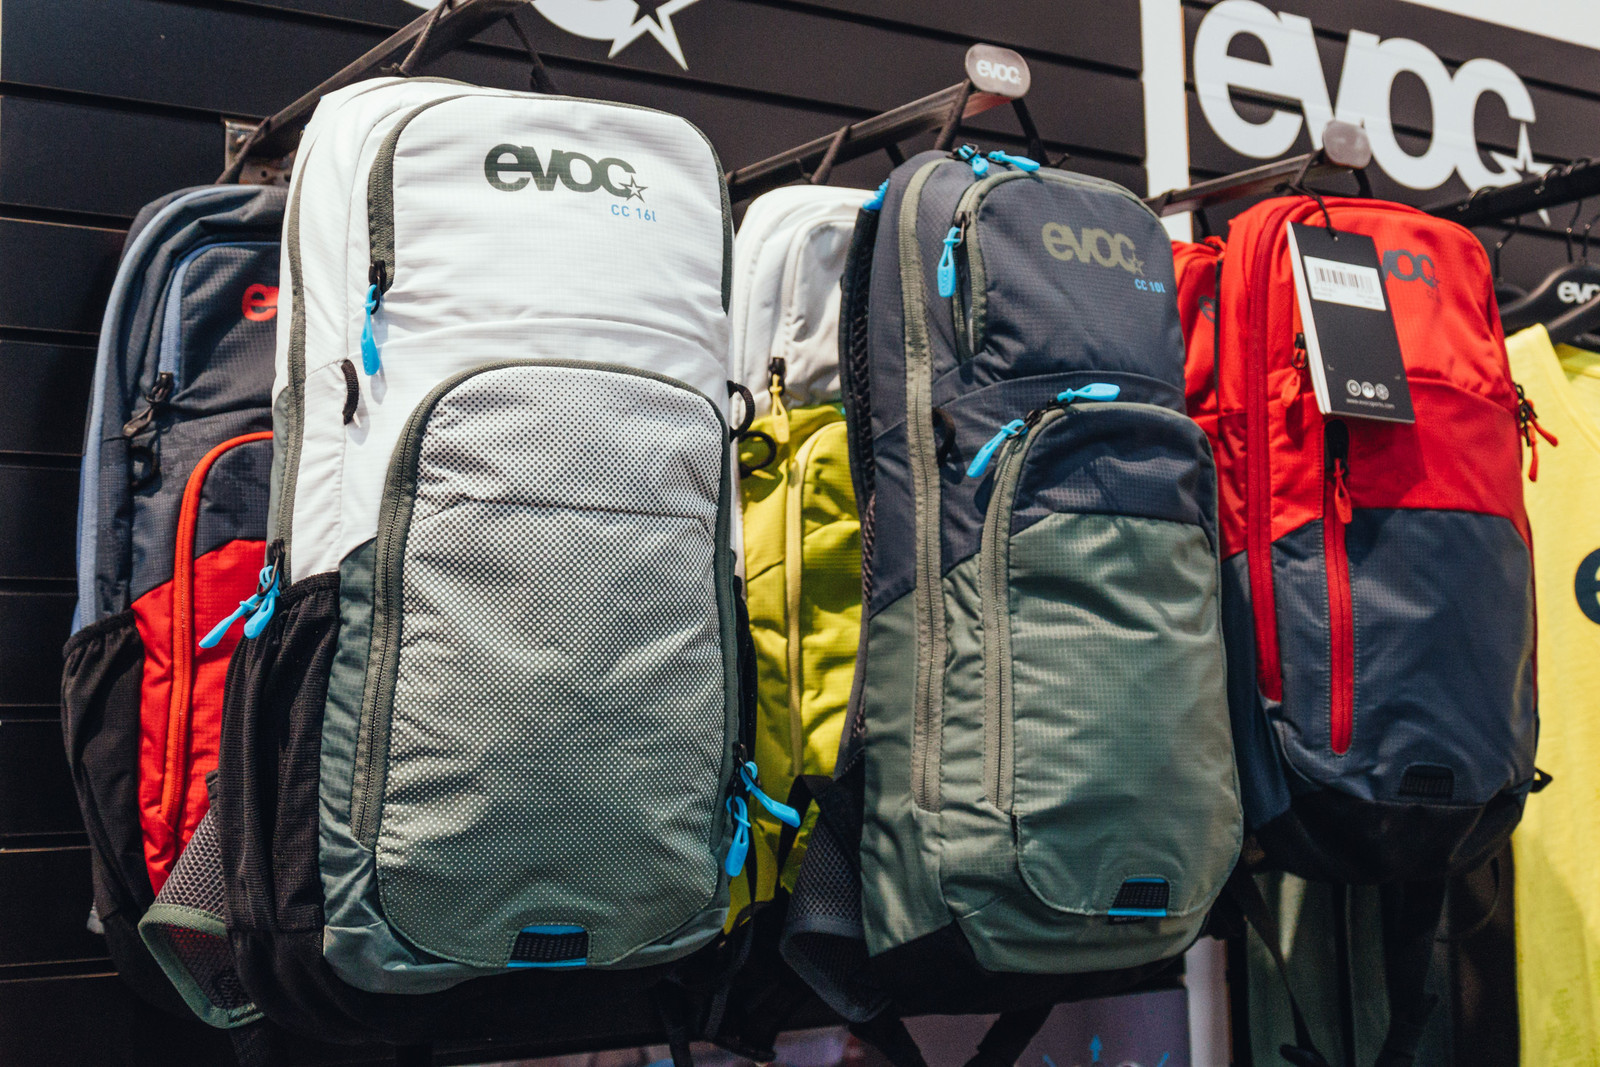 Evoc CC 10l Light Performance Packs - INTERBIKE - 2017 Women's Mountain Bike Gear - Mountain Biking Pictures - Vital MTB